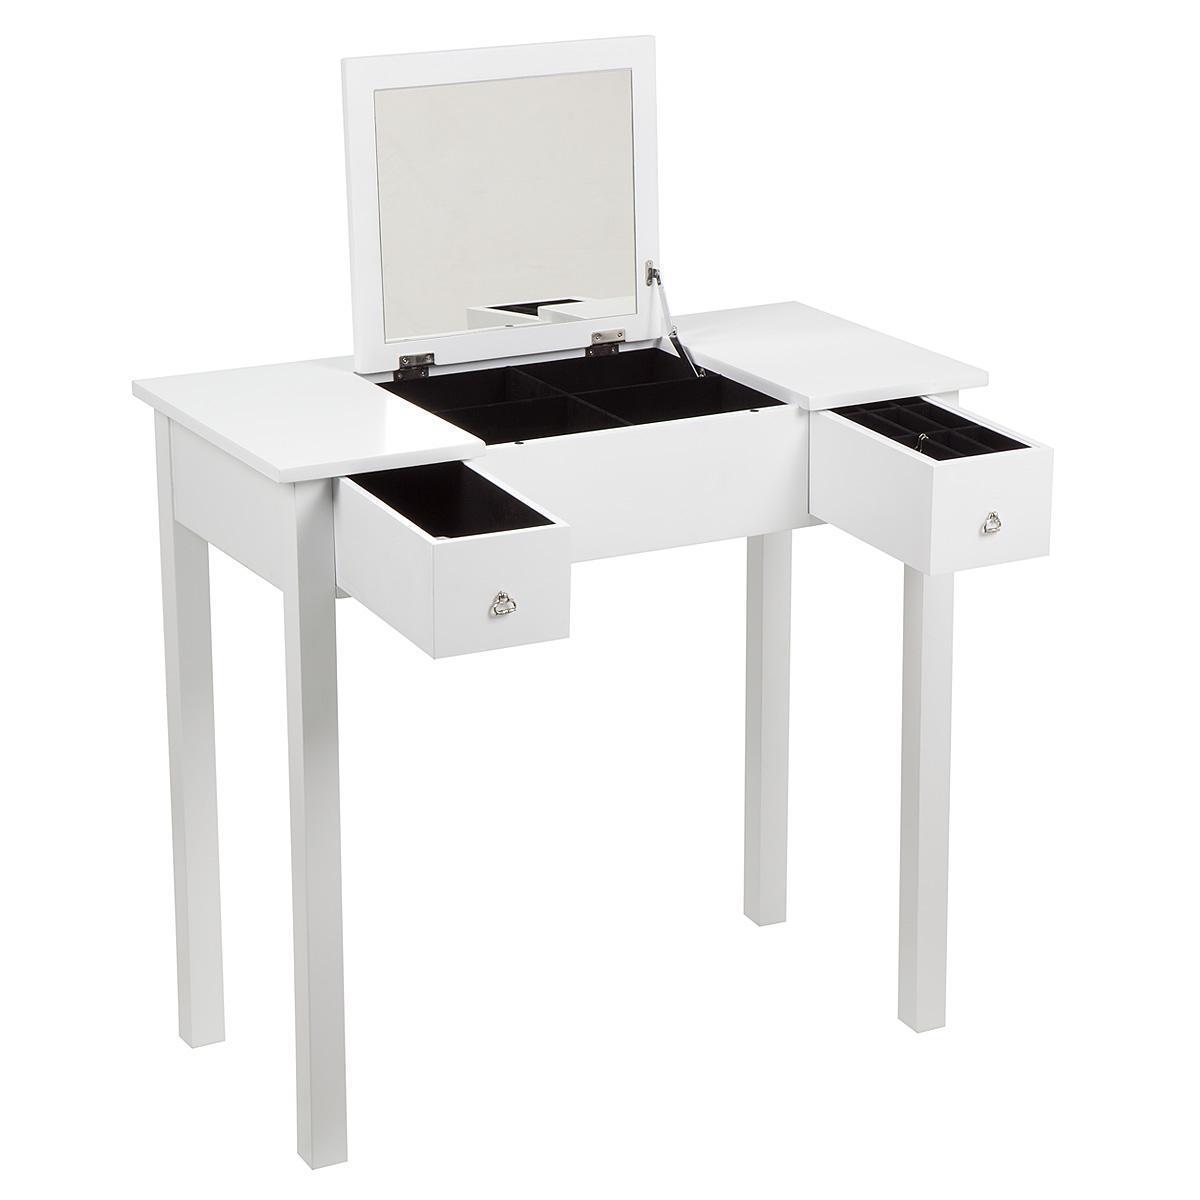 professional makeup chair uk unusual modern bedroom dressing room table with folding vanity mirror